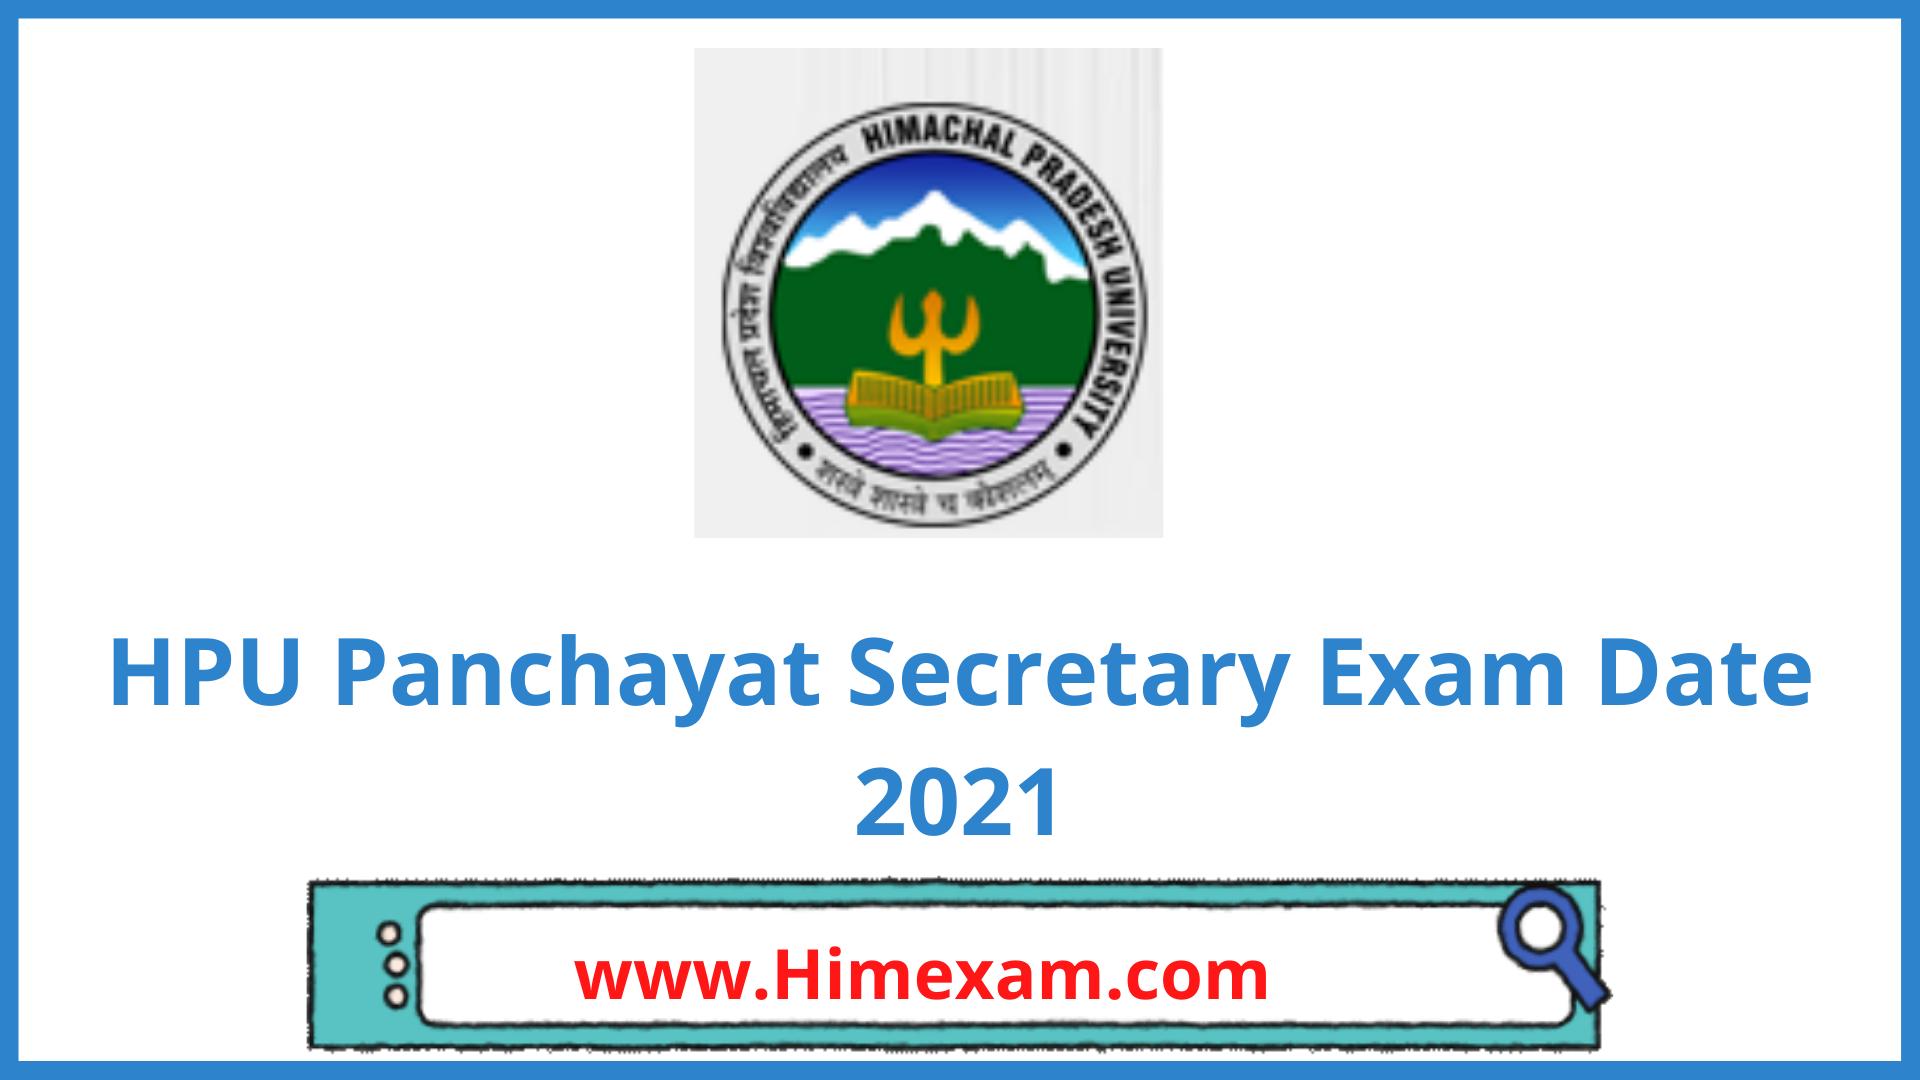 HPU Panchayat Secretary Exam Date 2021